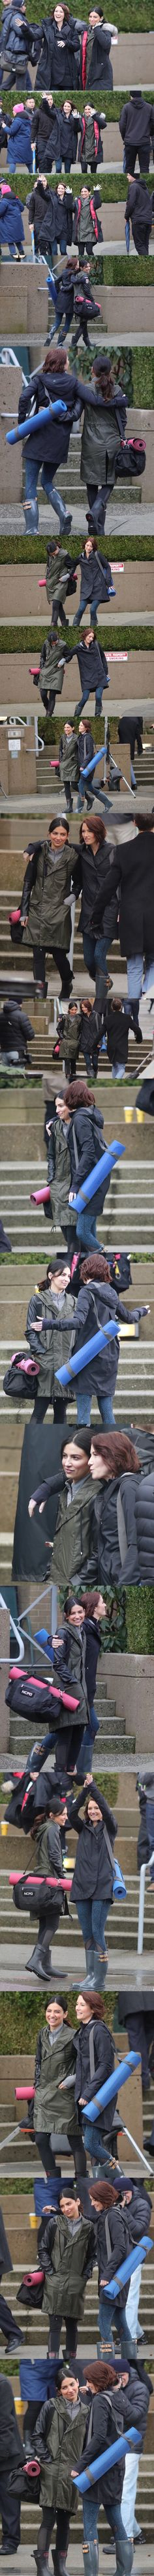 Sanvers filming for 2x17 - Alex Danvers - Maggie Sawyer - Supergirl - Season 2